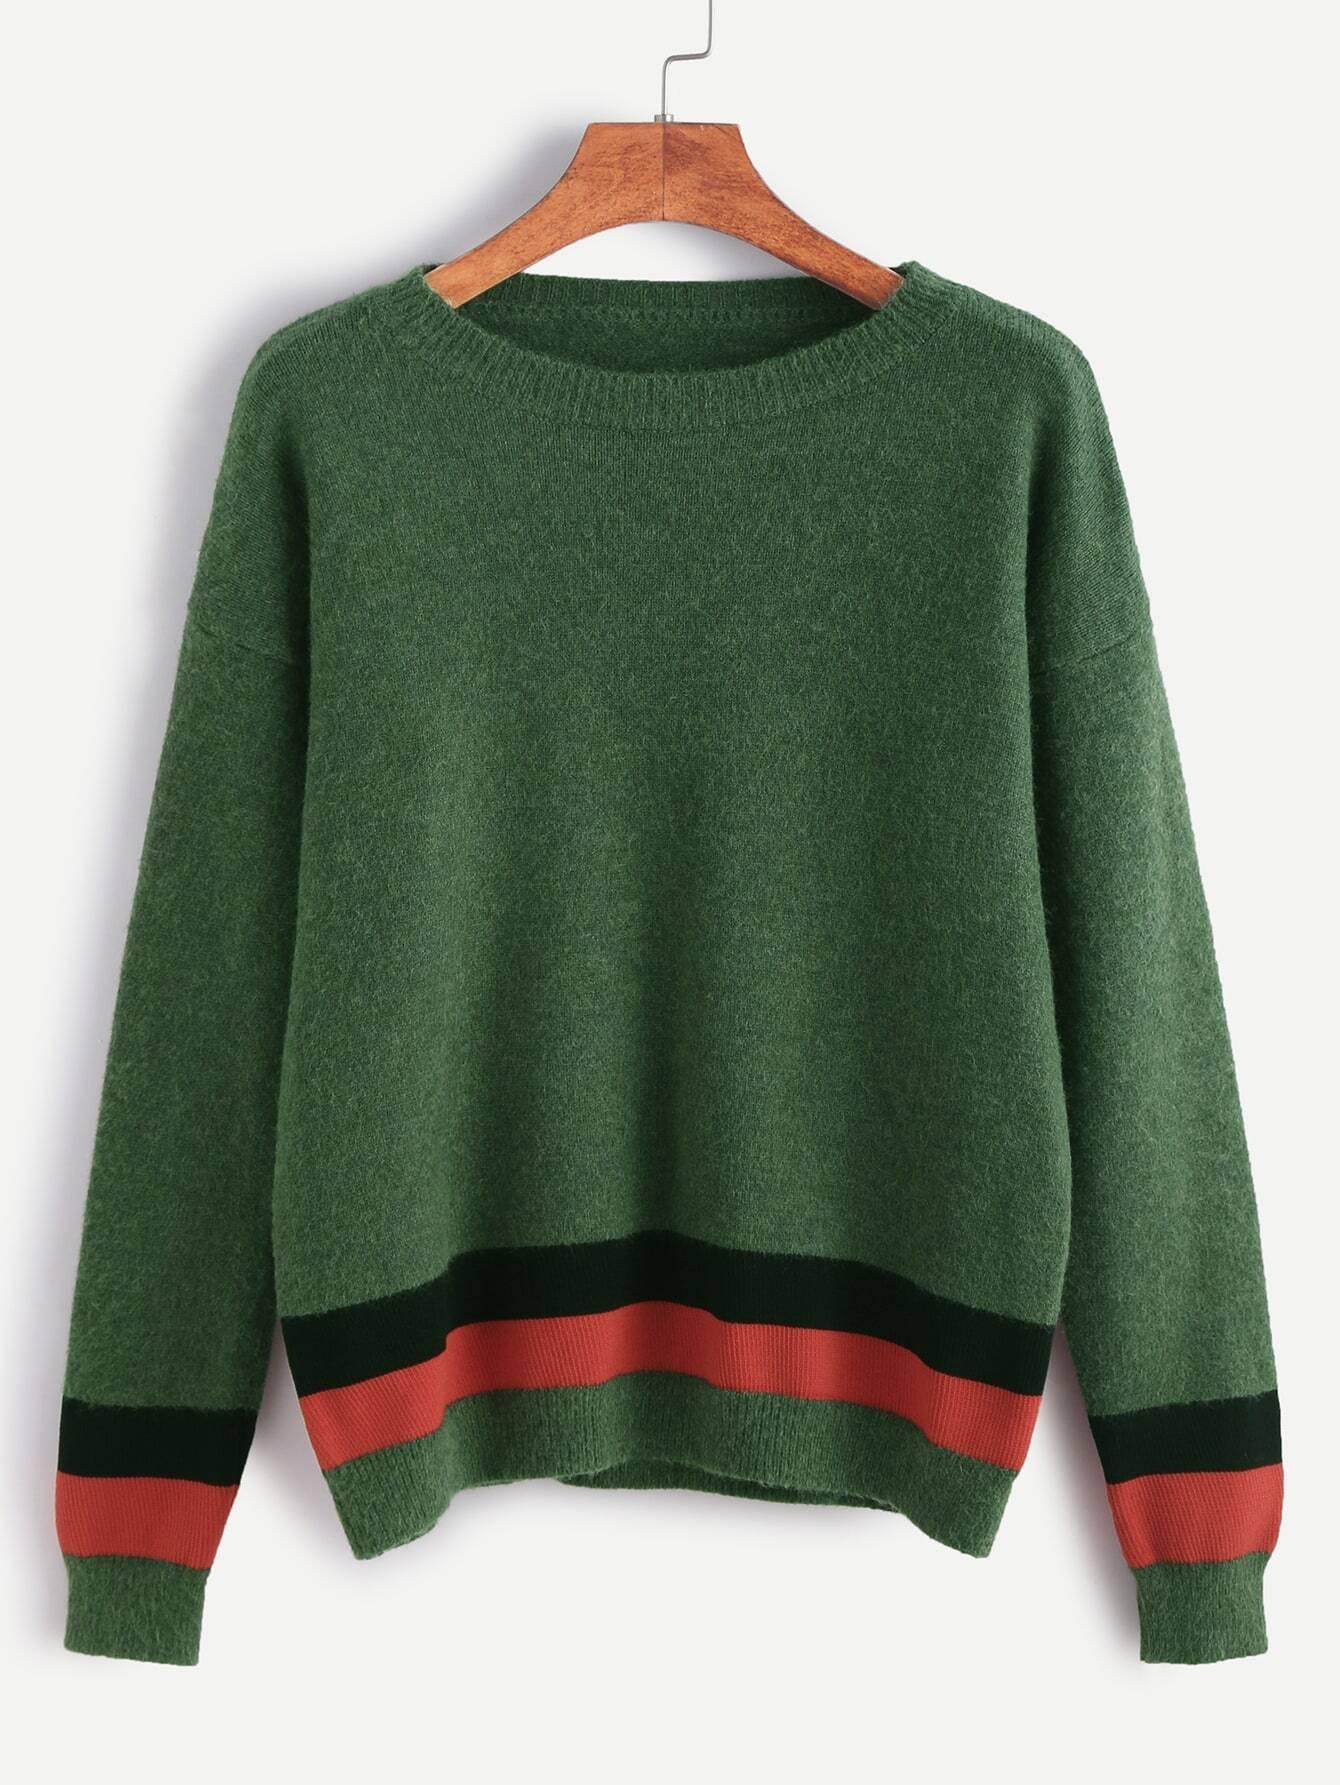 Green Drop Shoulder Striped Trim Sweater sweater161104007